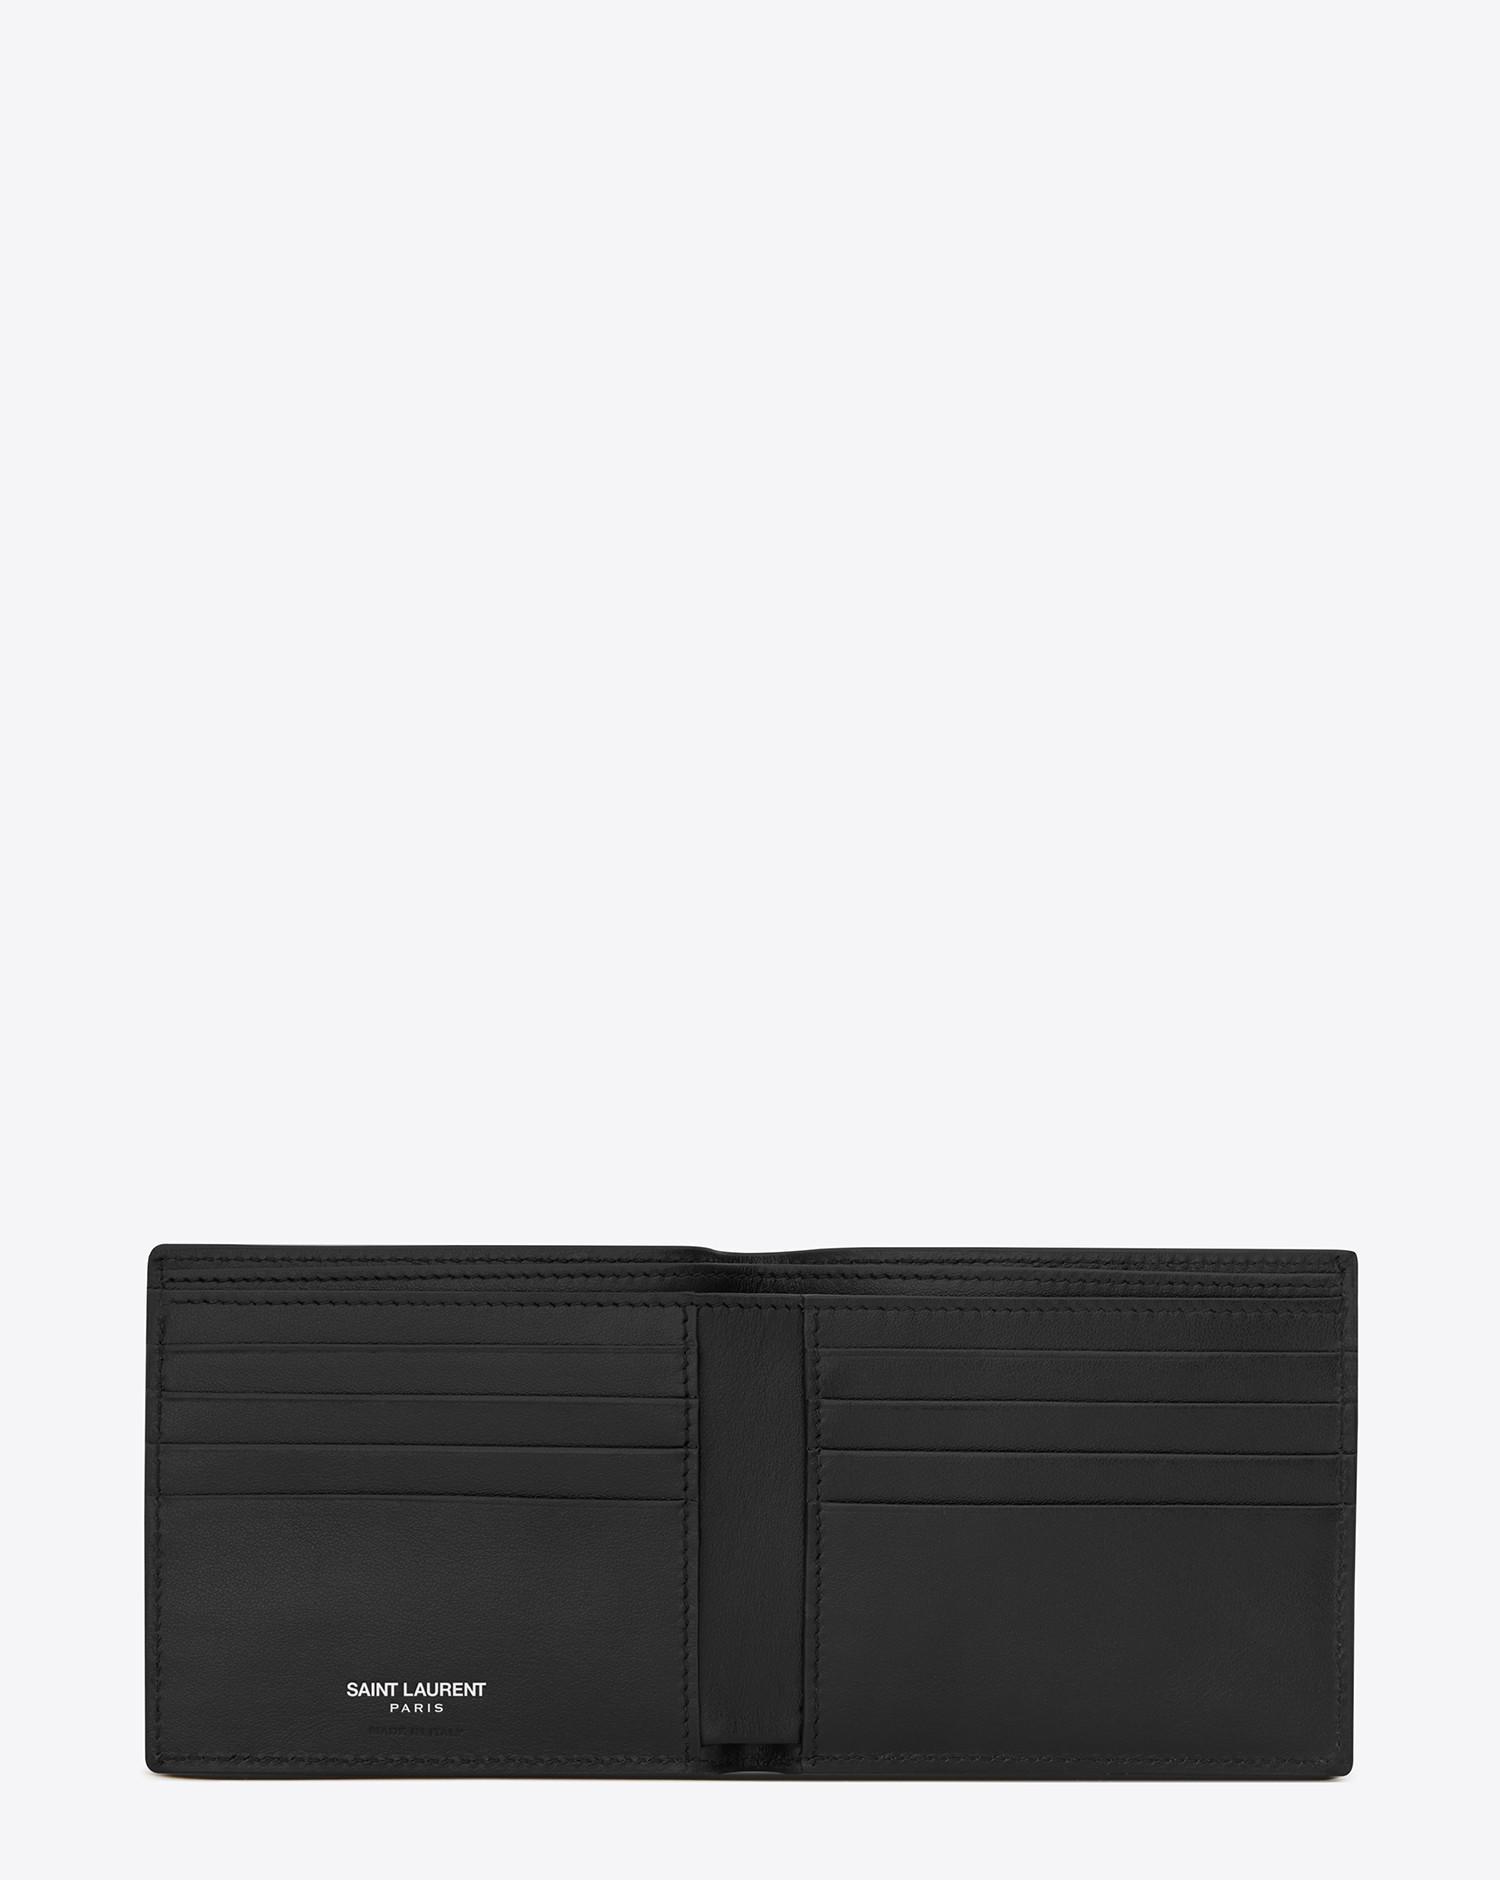 59ebaa9bcac Saint Laurent Paris Ysl Shield Patch East/west Wallet In Black ...